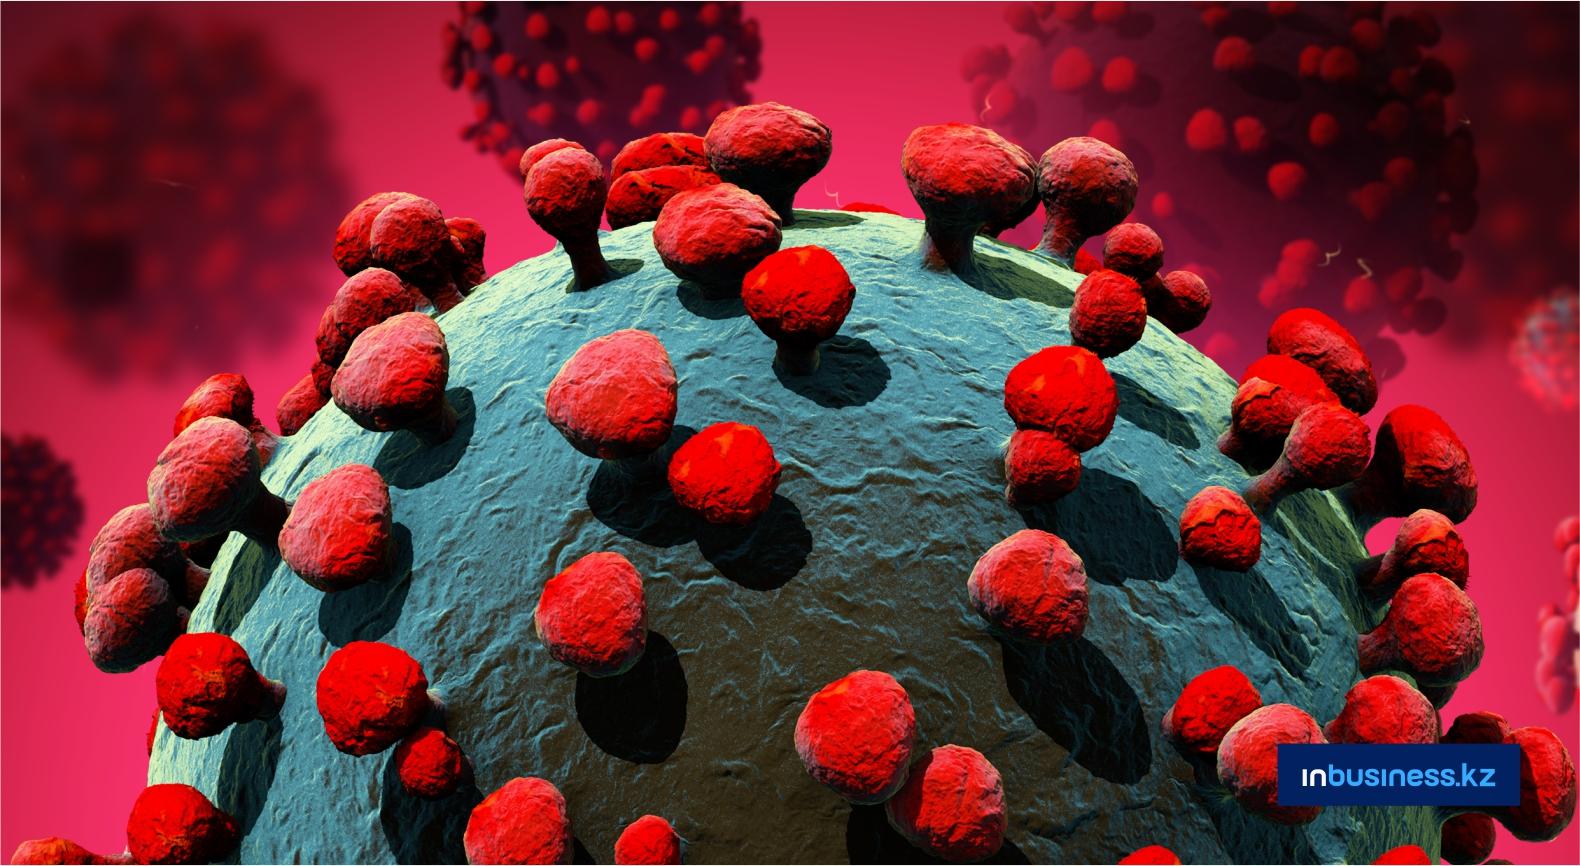 Названы ограничения для вакцинации от коронавируса